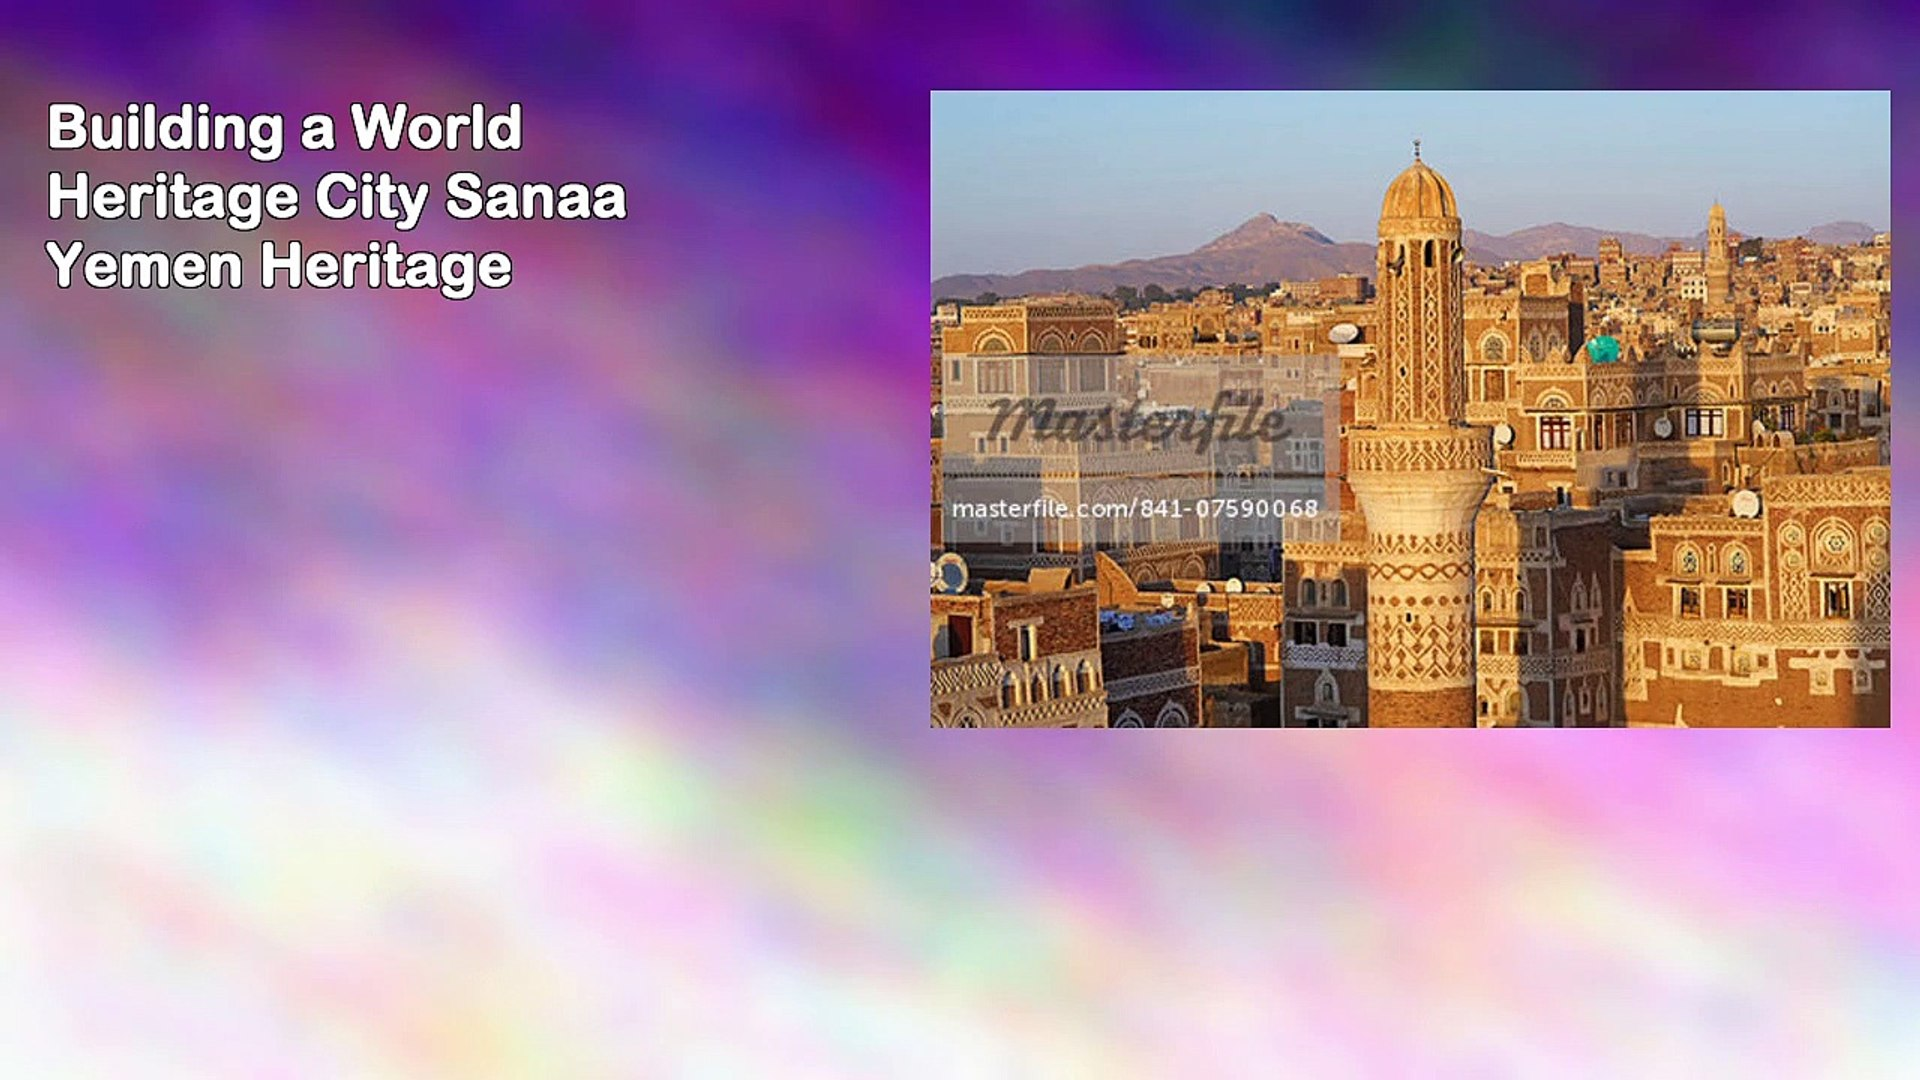 Building a World Heritage City Sanaa Yemen Heritage